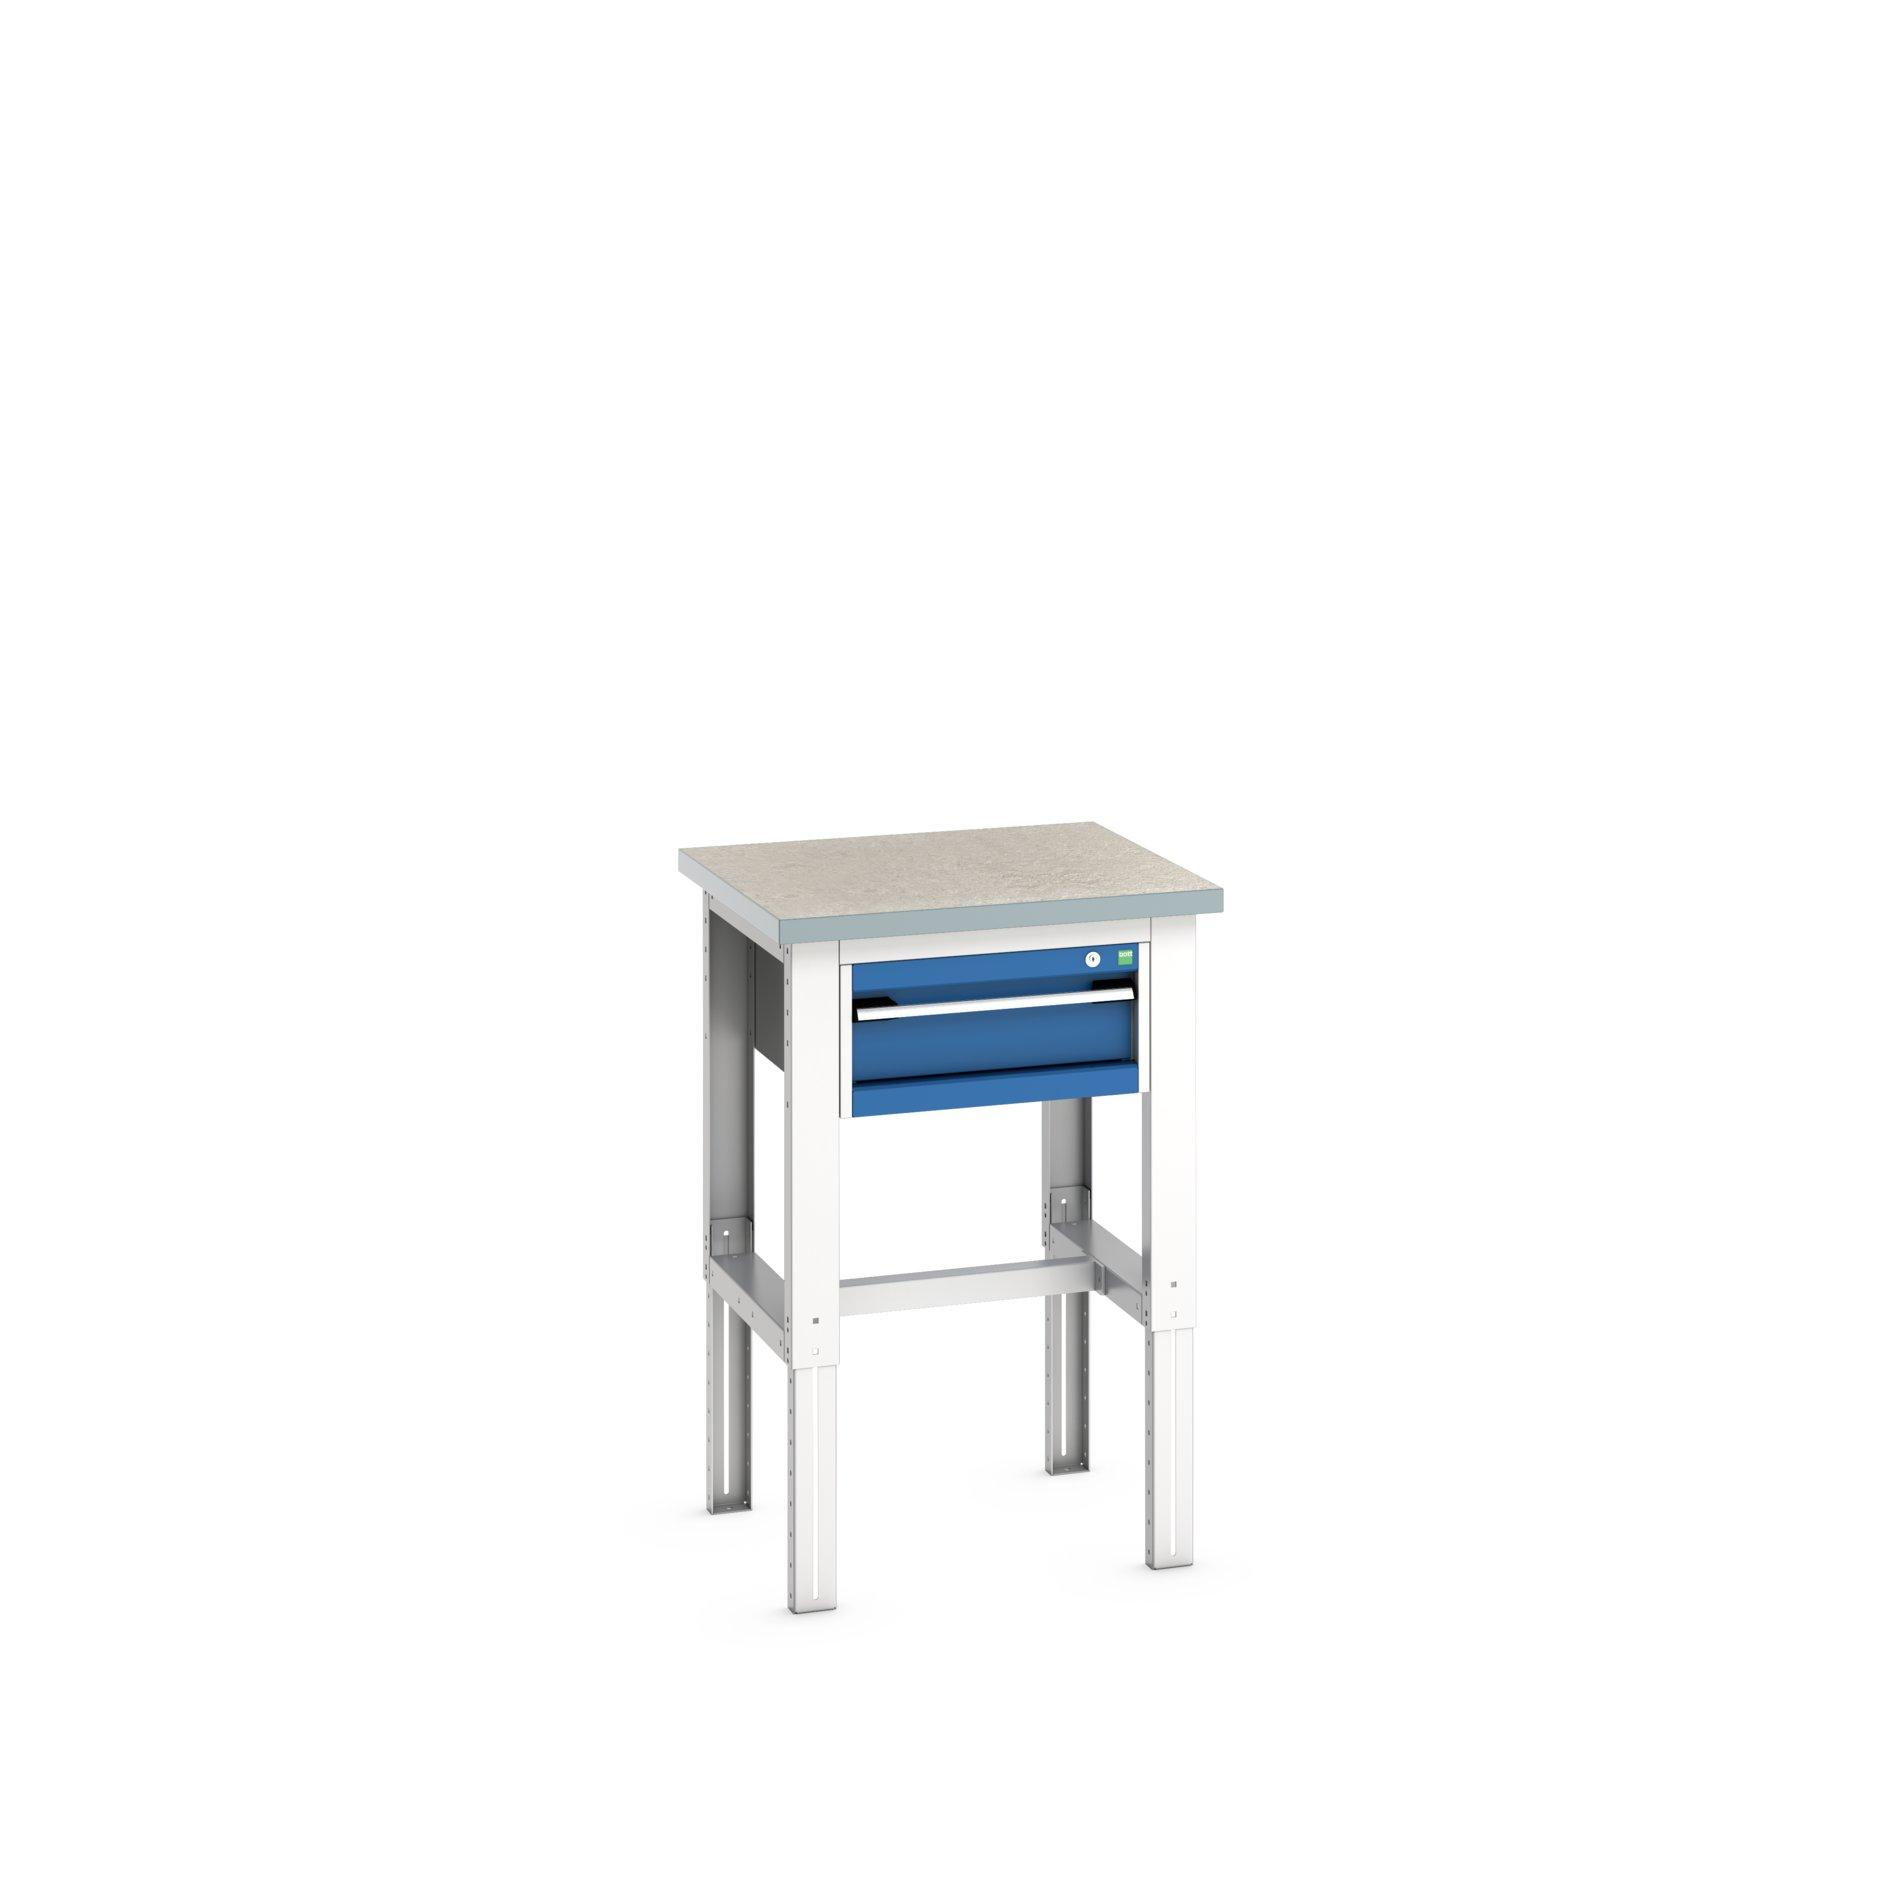 Bott Cubio Adjustable Height Workstand With 1 Drawer Cabinet